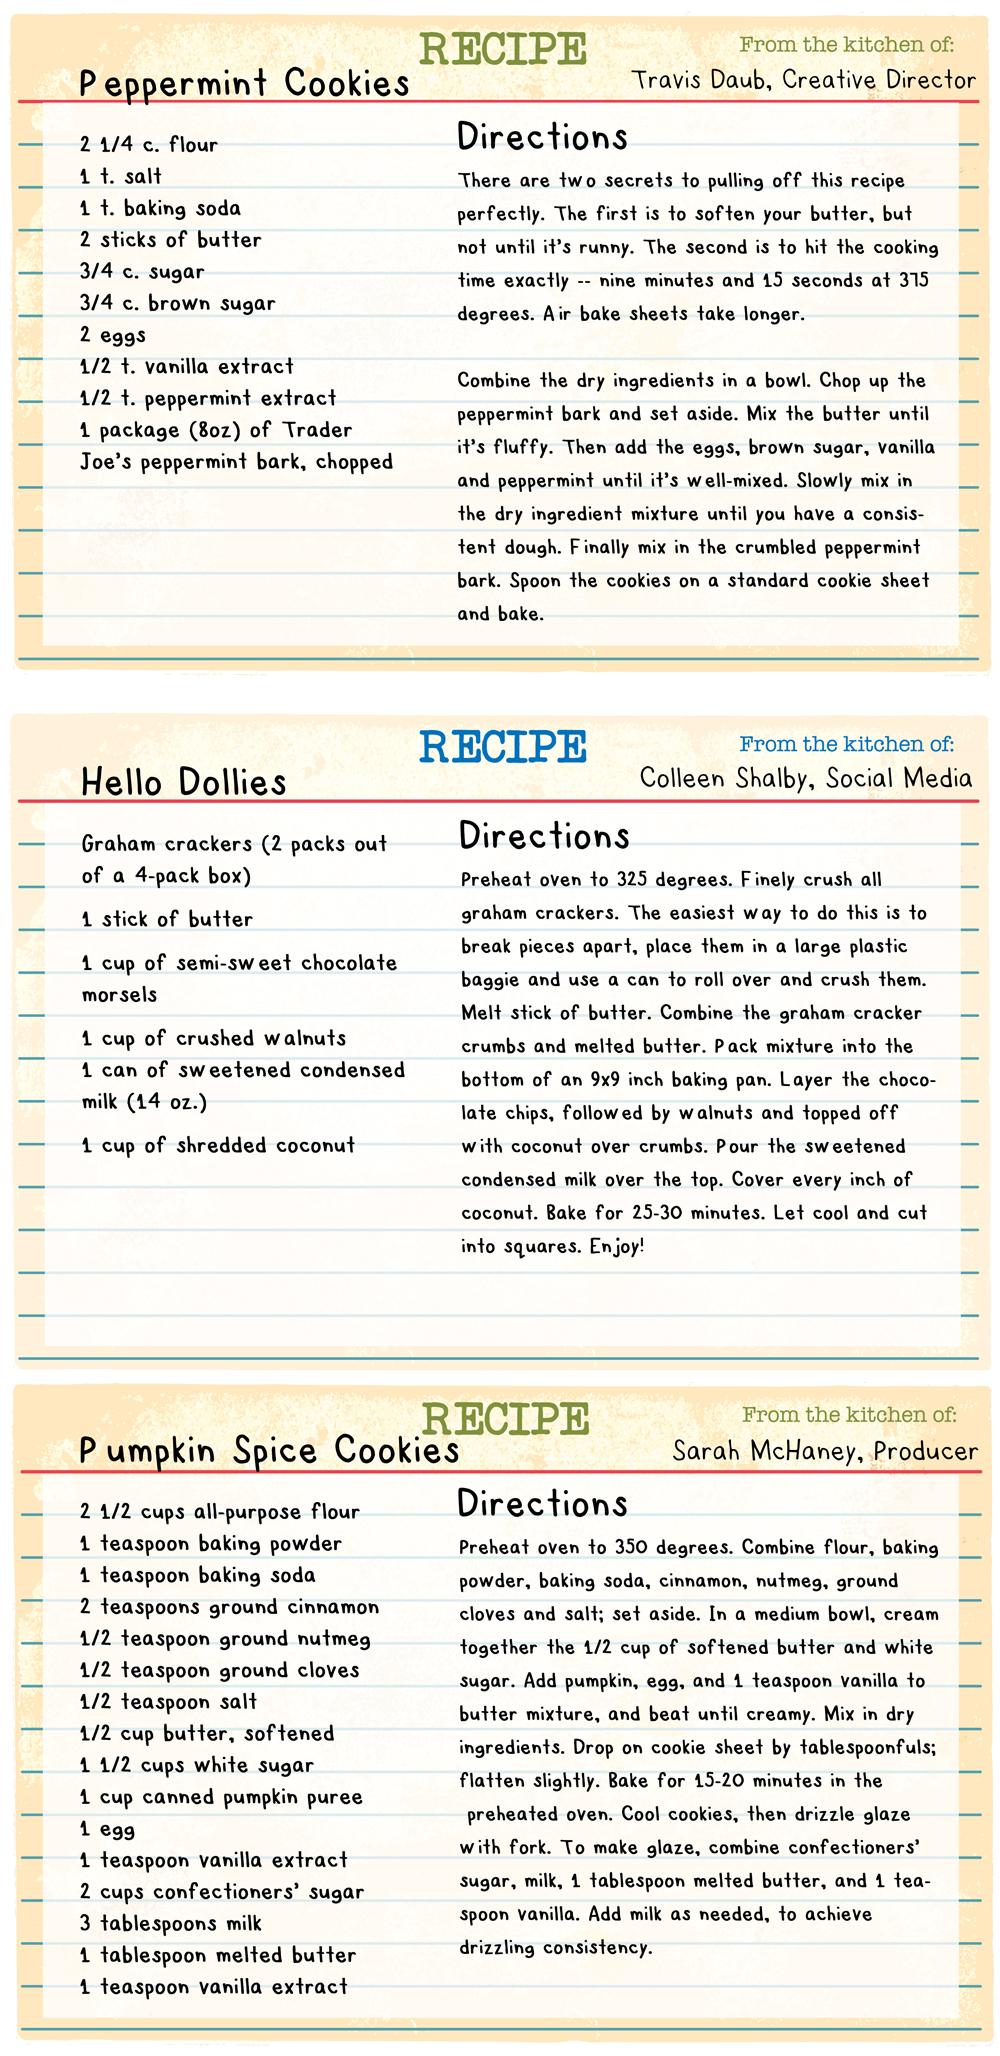 cookierecipes